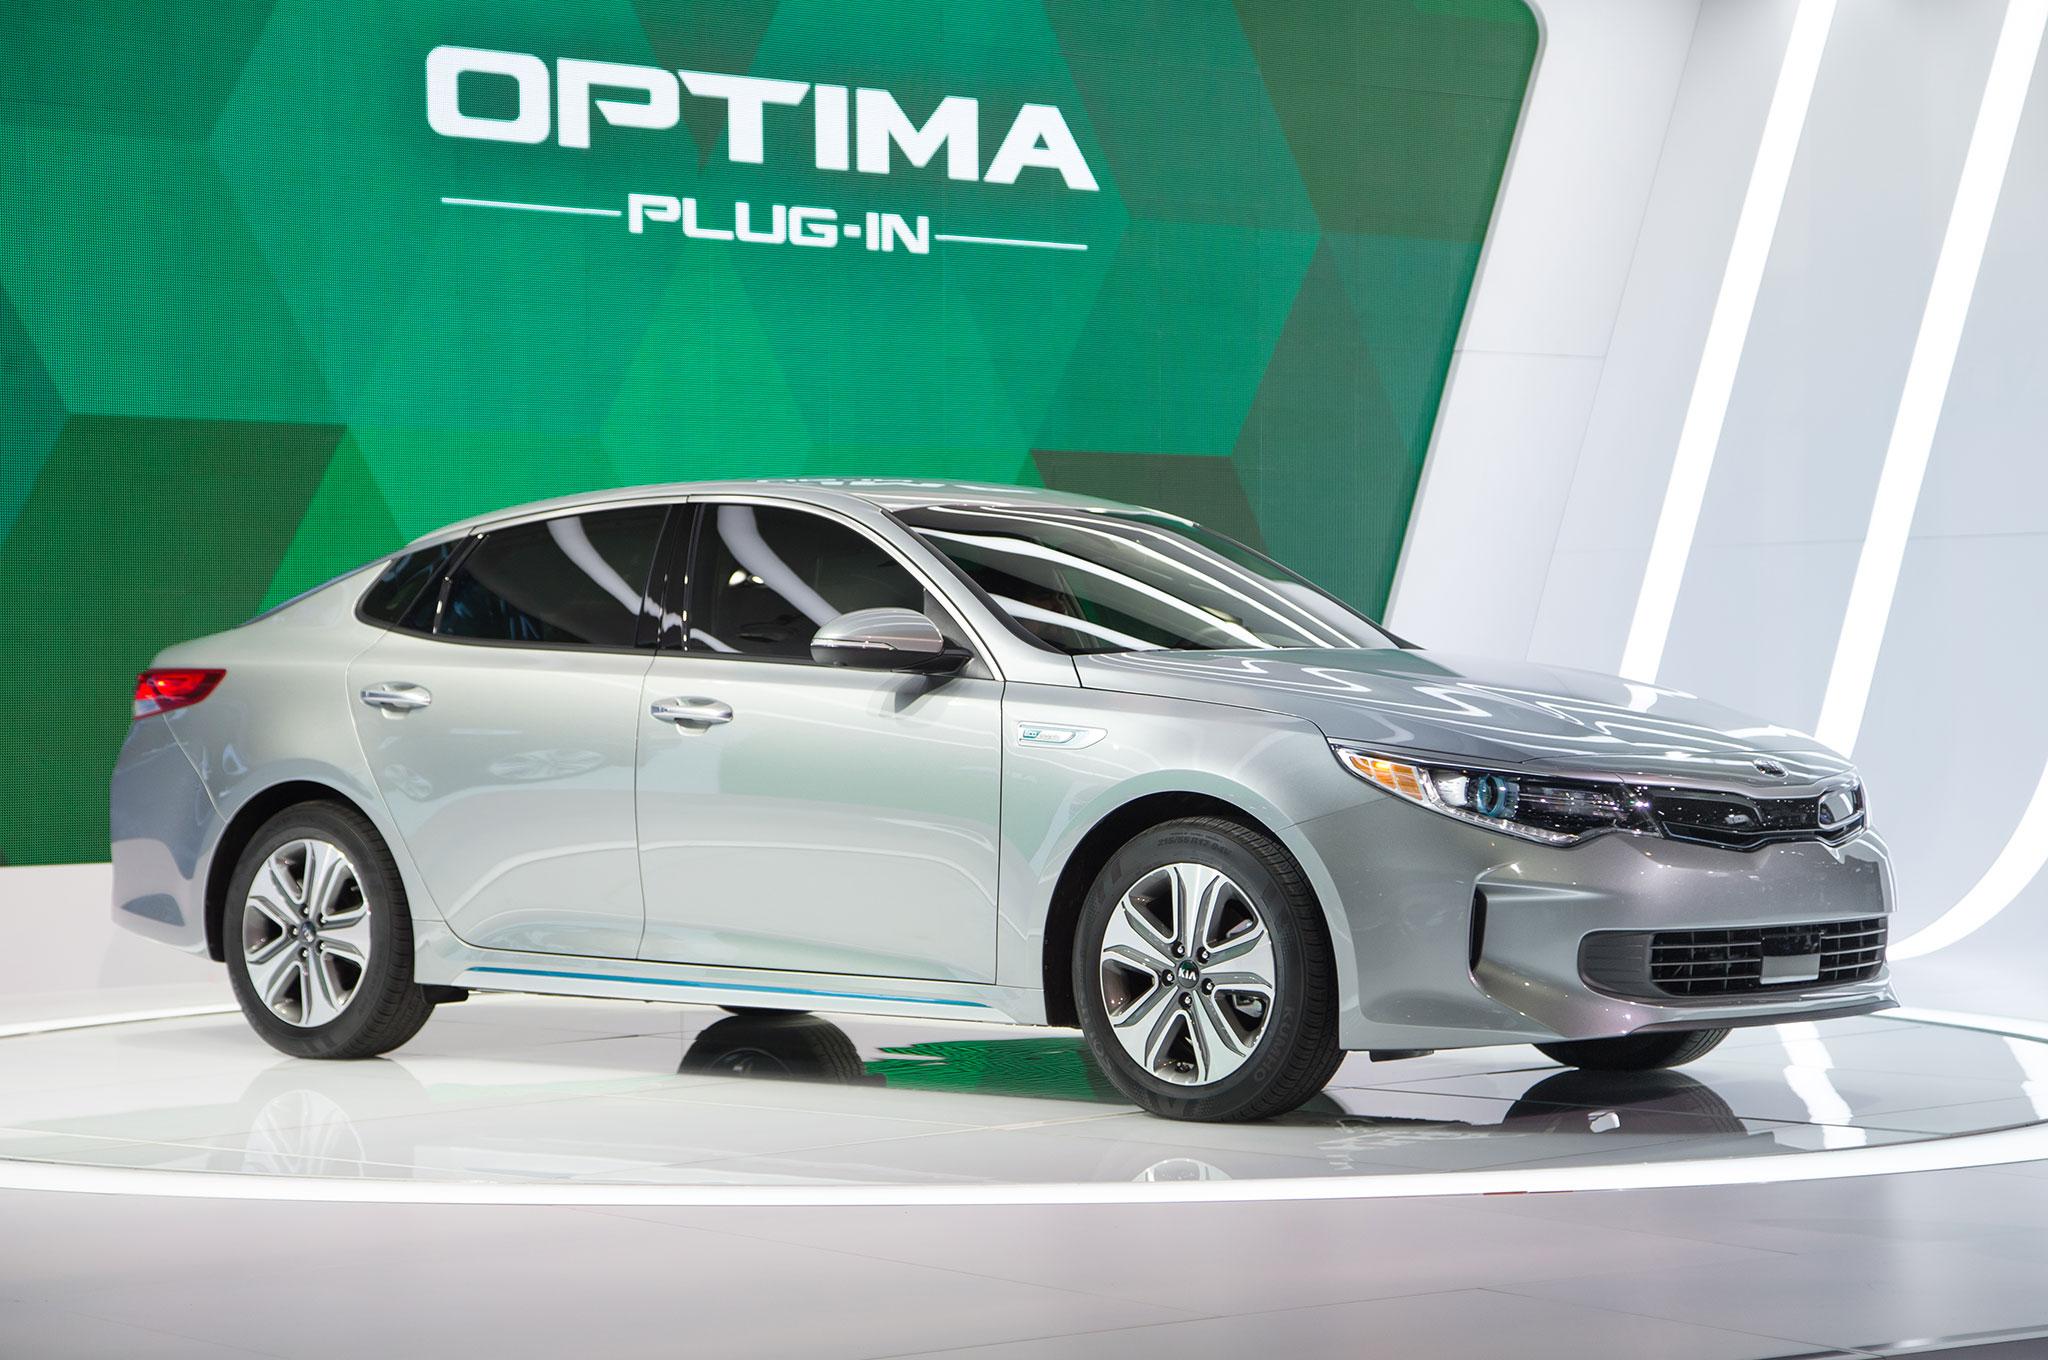 2017 Kia Optima Plug In Hybrid Front Three Quarter 02